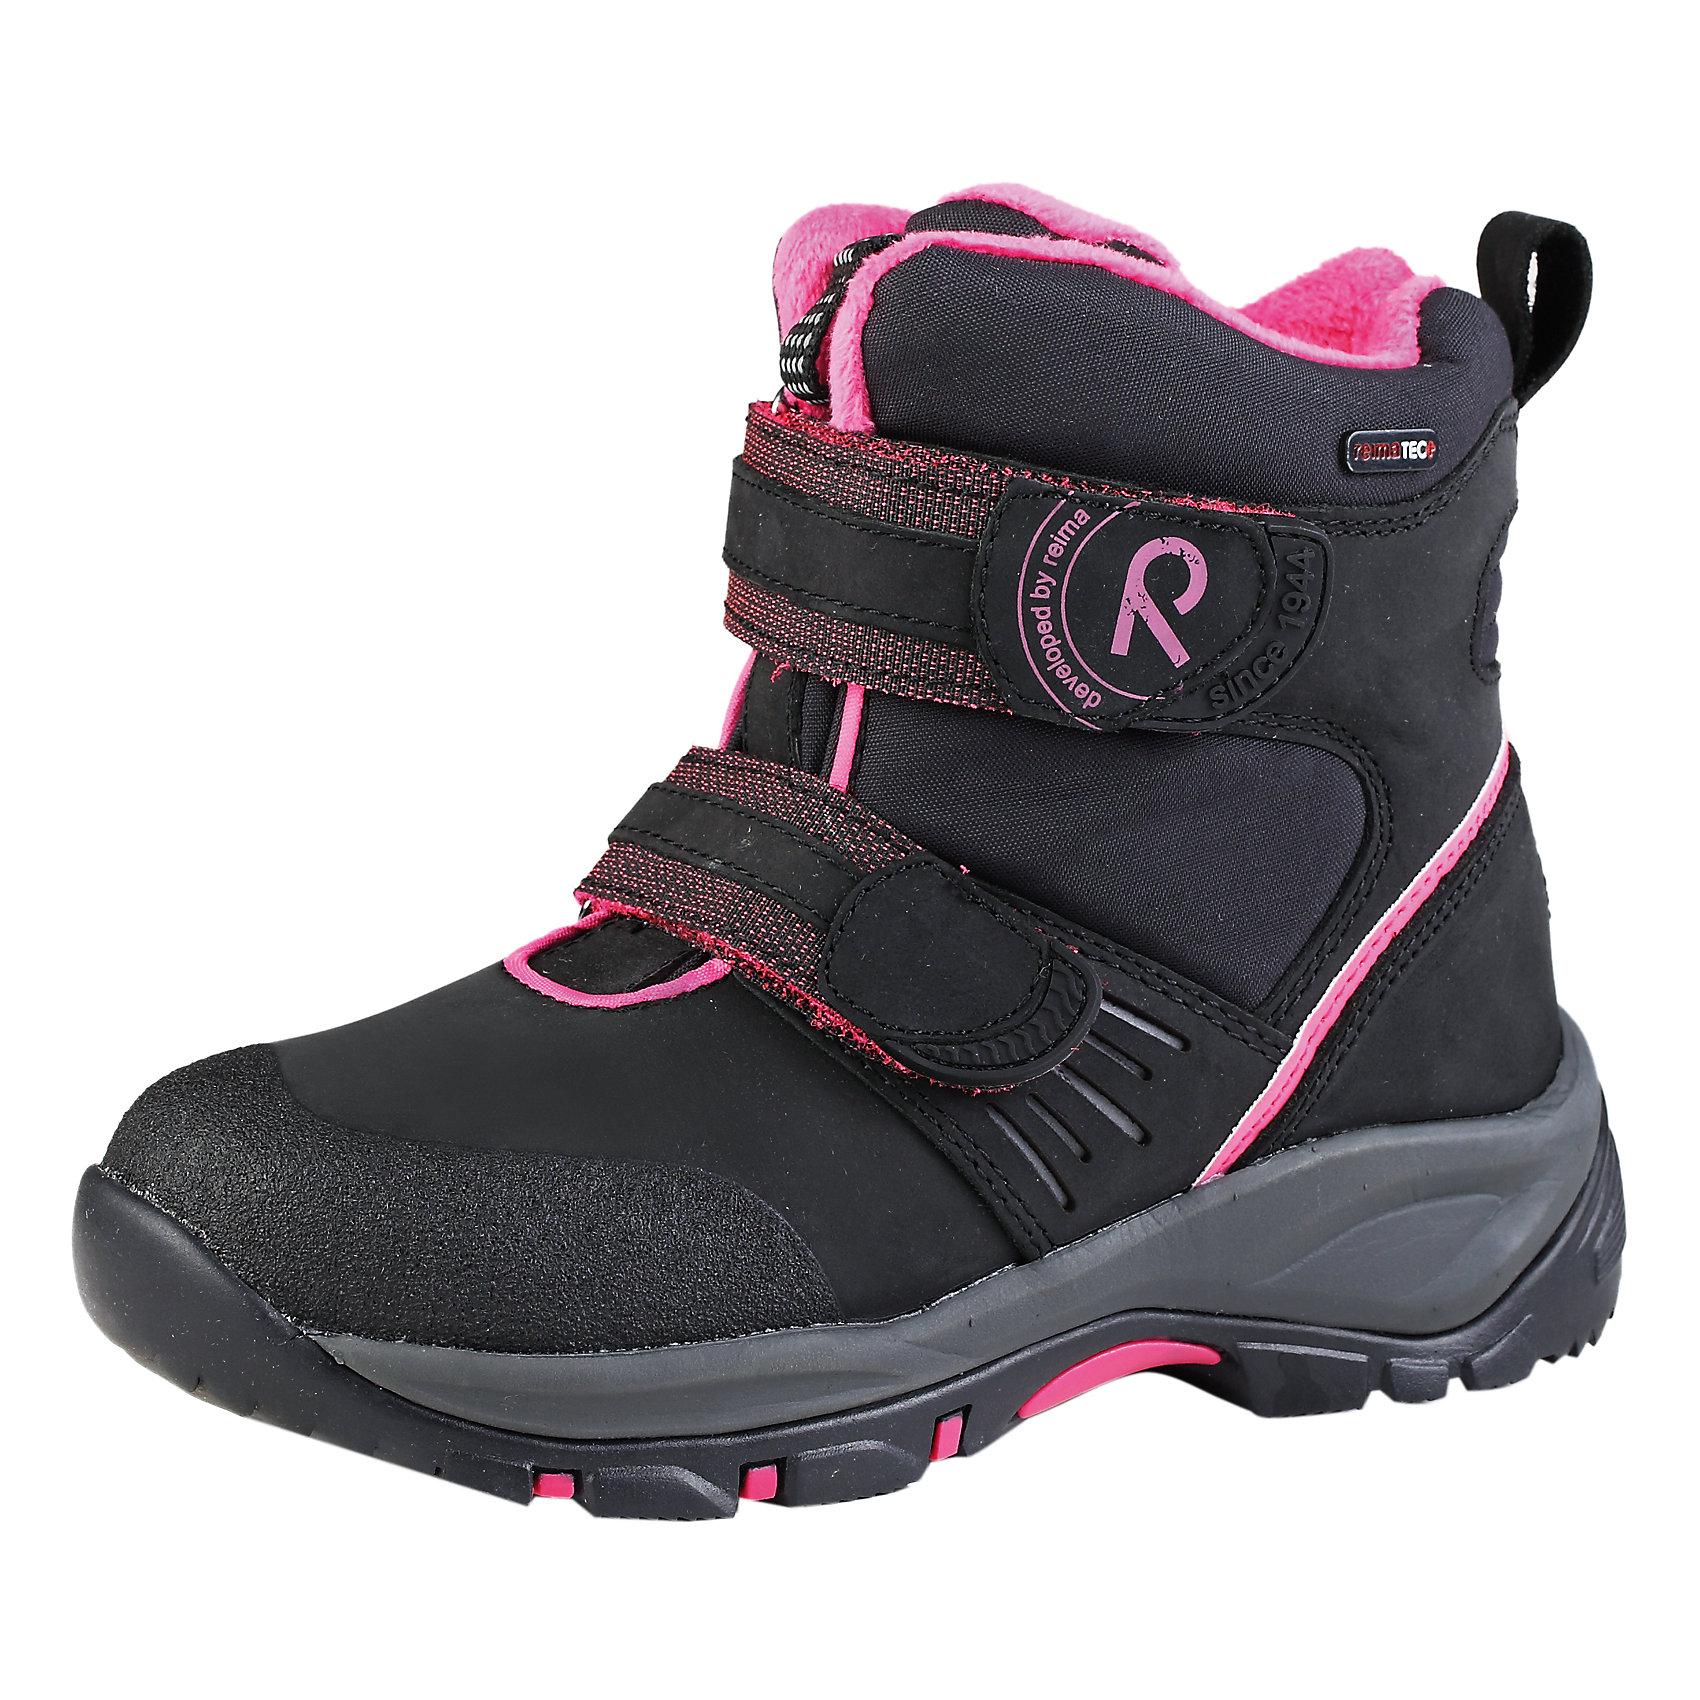 Reima Ботинки для девочки Reimatec Reima